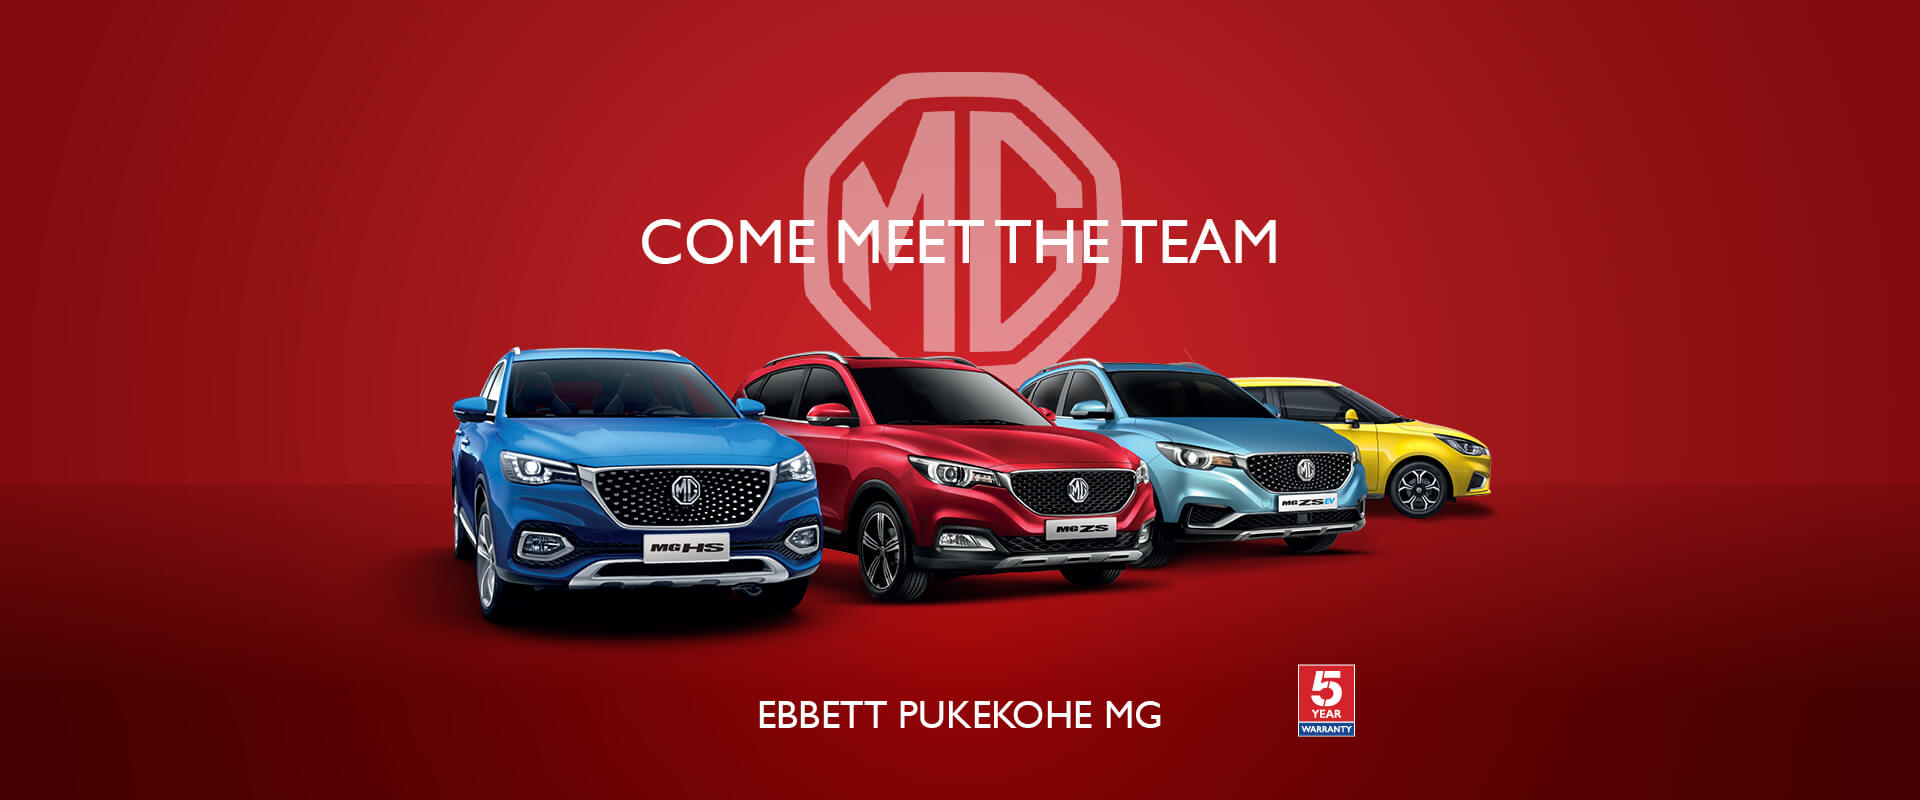 New Dealership Ebbett Pukekohe MG